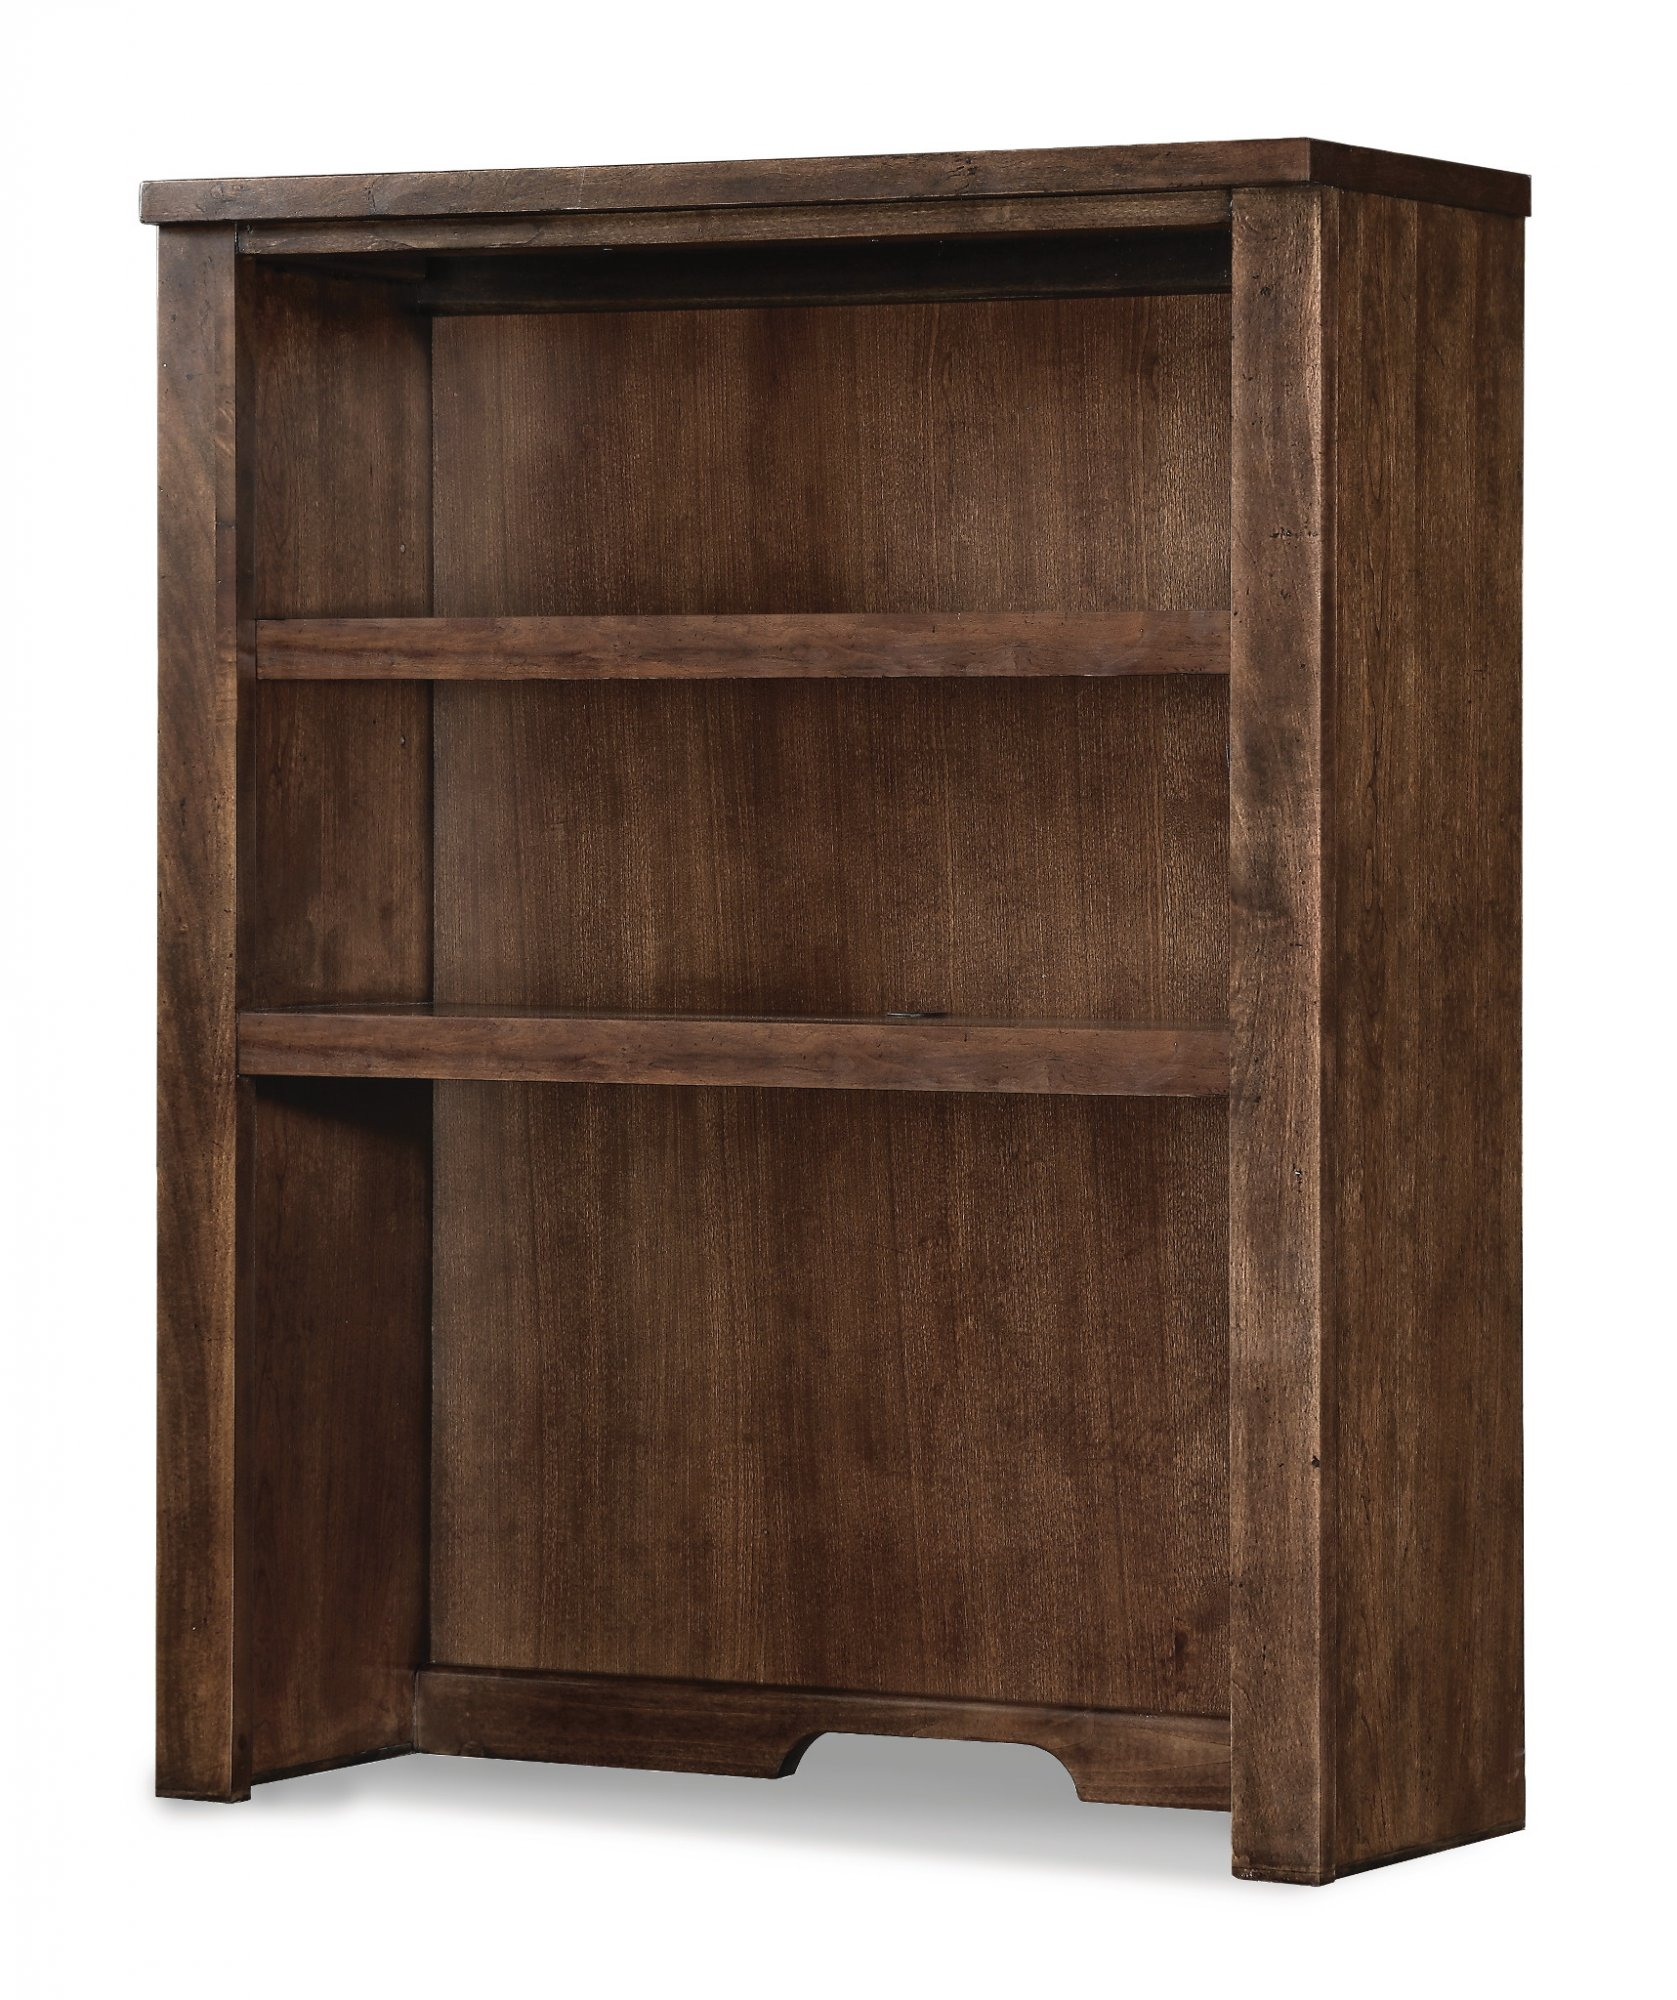 Flexsteel Theodore  Bookcase Hutch